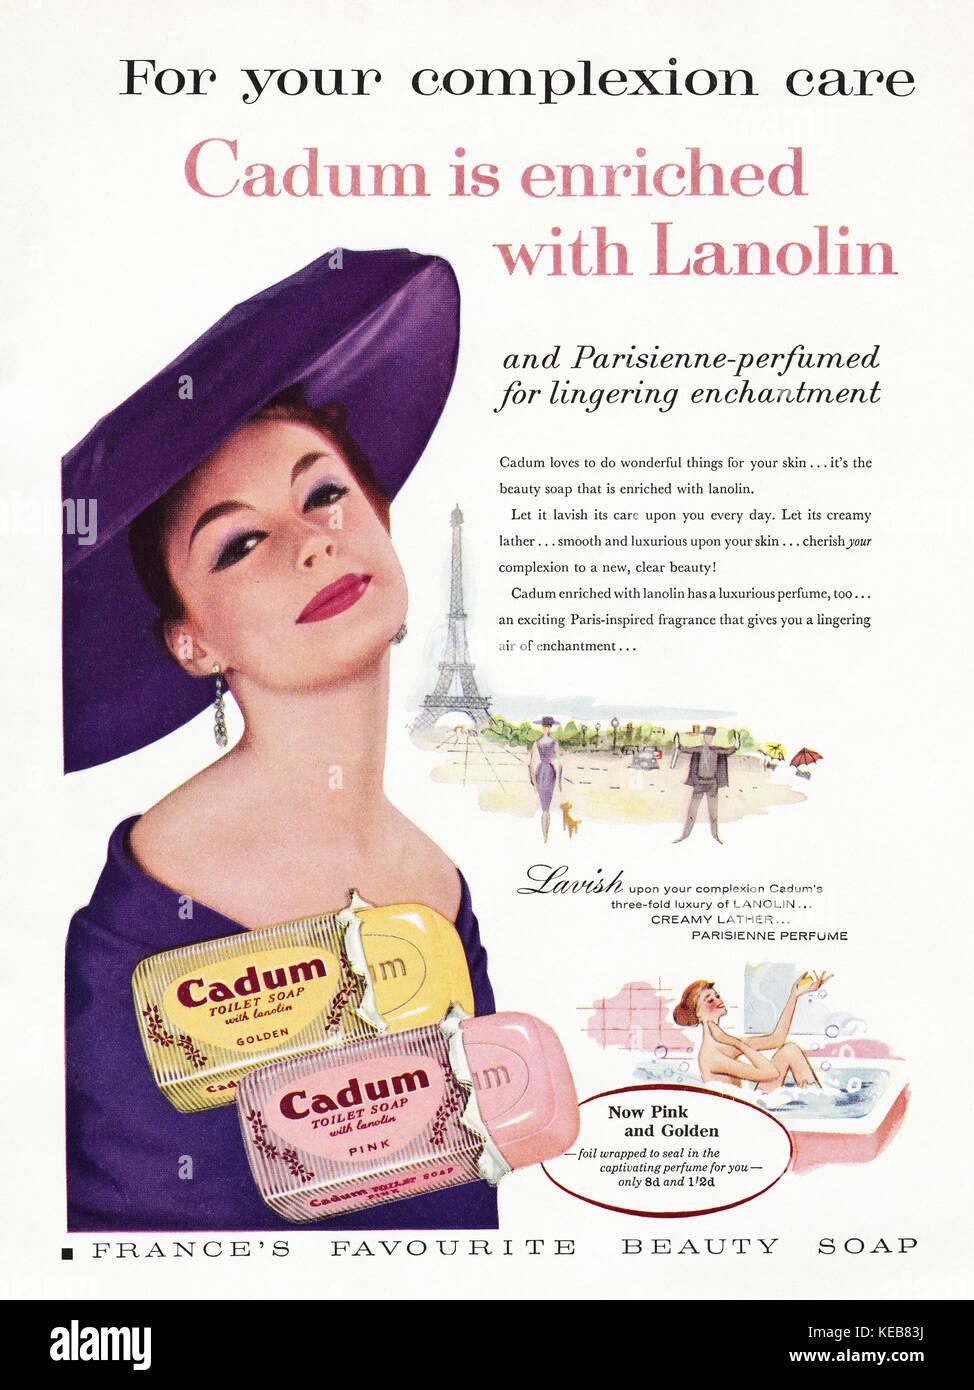 1950s advert old vintage original british magazine advertisement advertising Cadum Toilet Soap dated 1958 - Stock Image